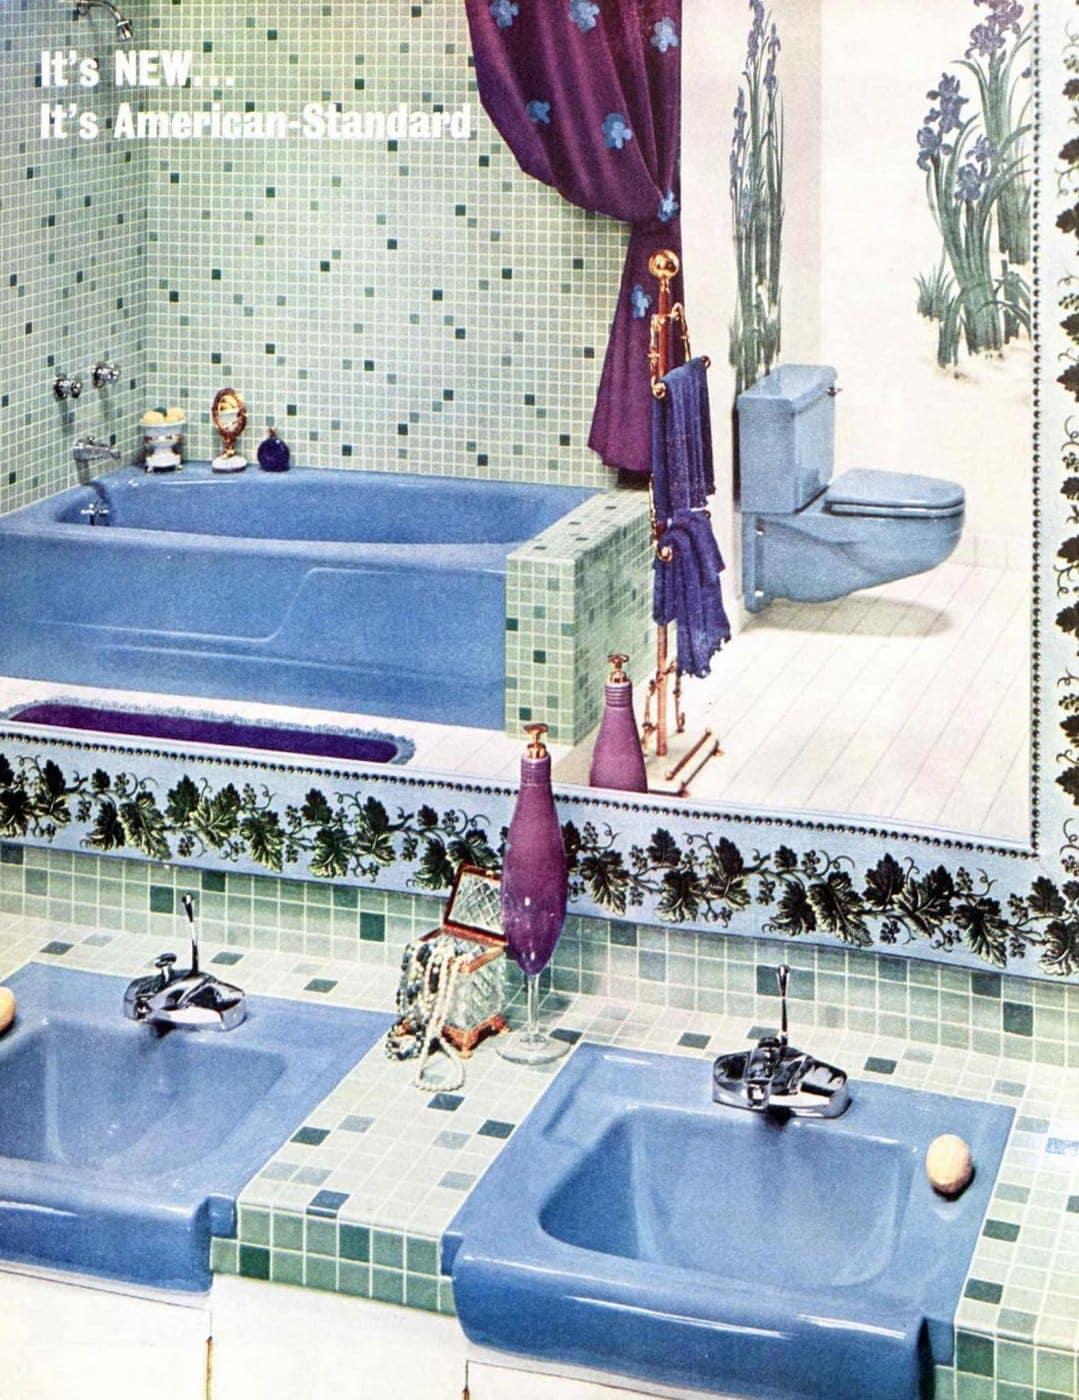 Blue bathroom fixtures from 1960